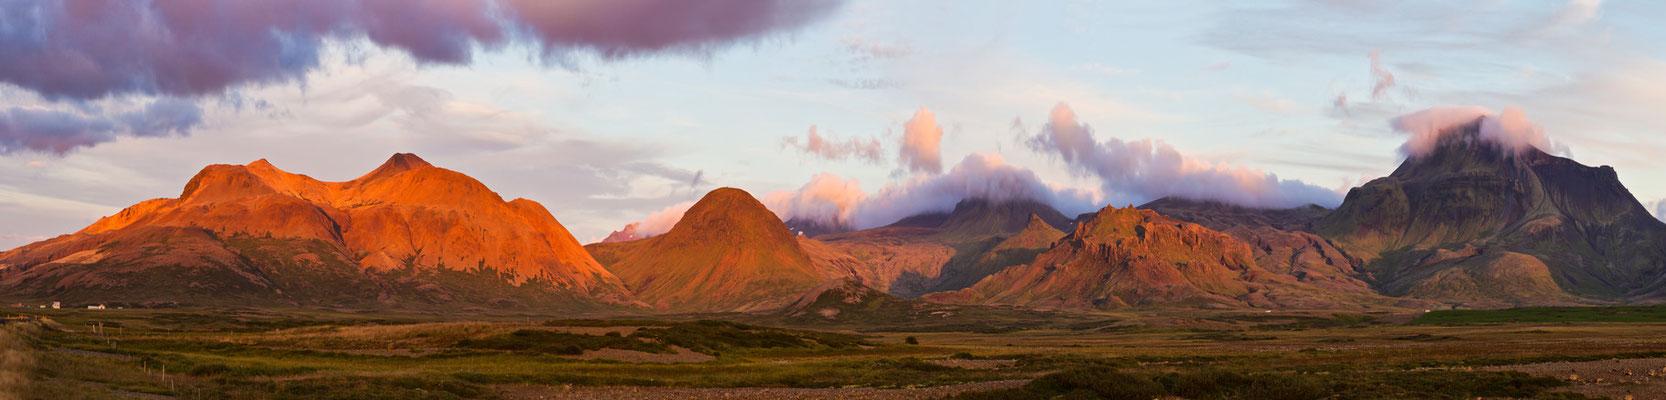 Islandglühen - Island